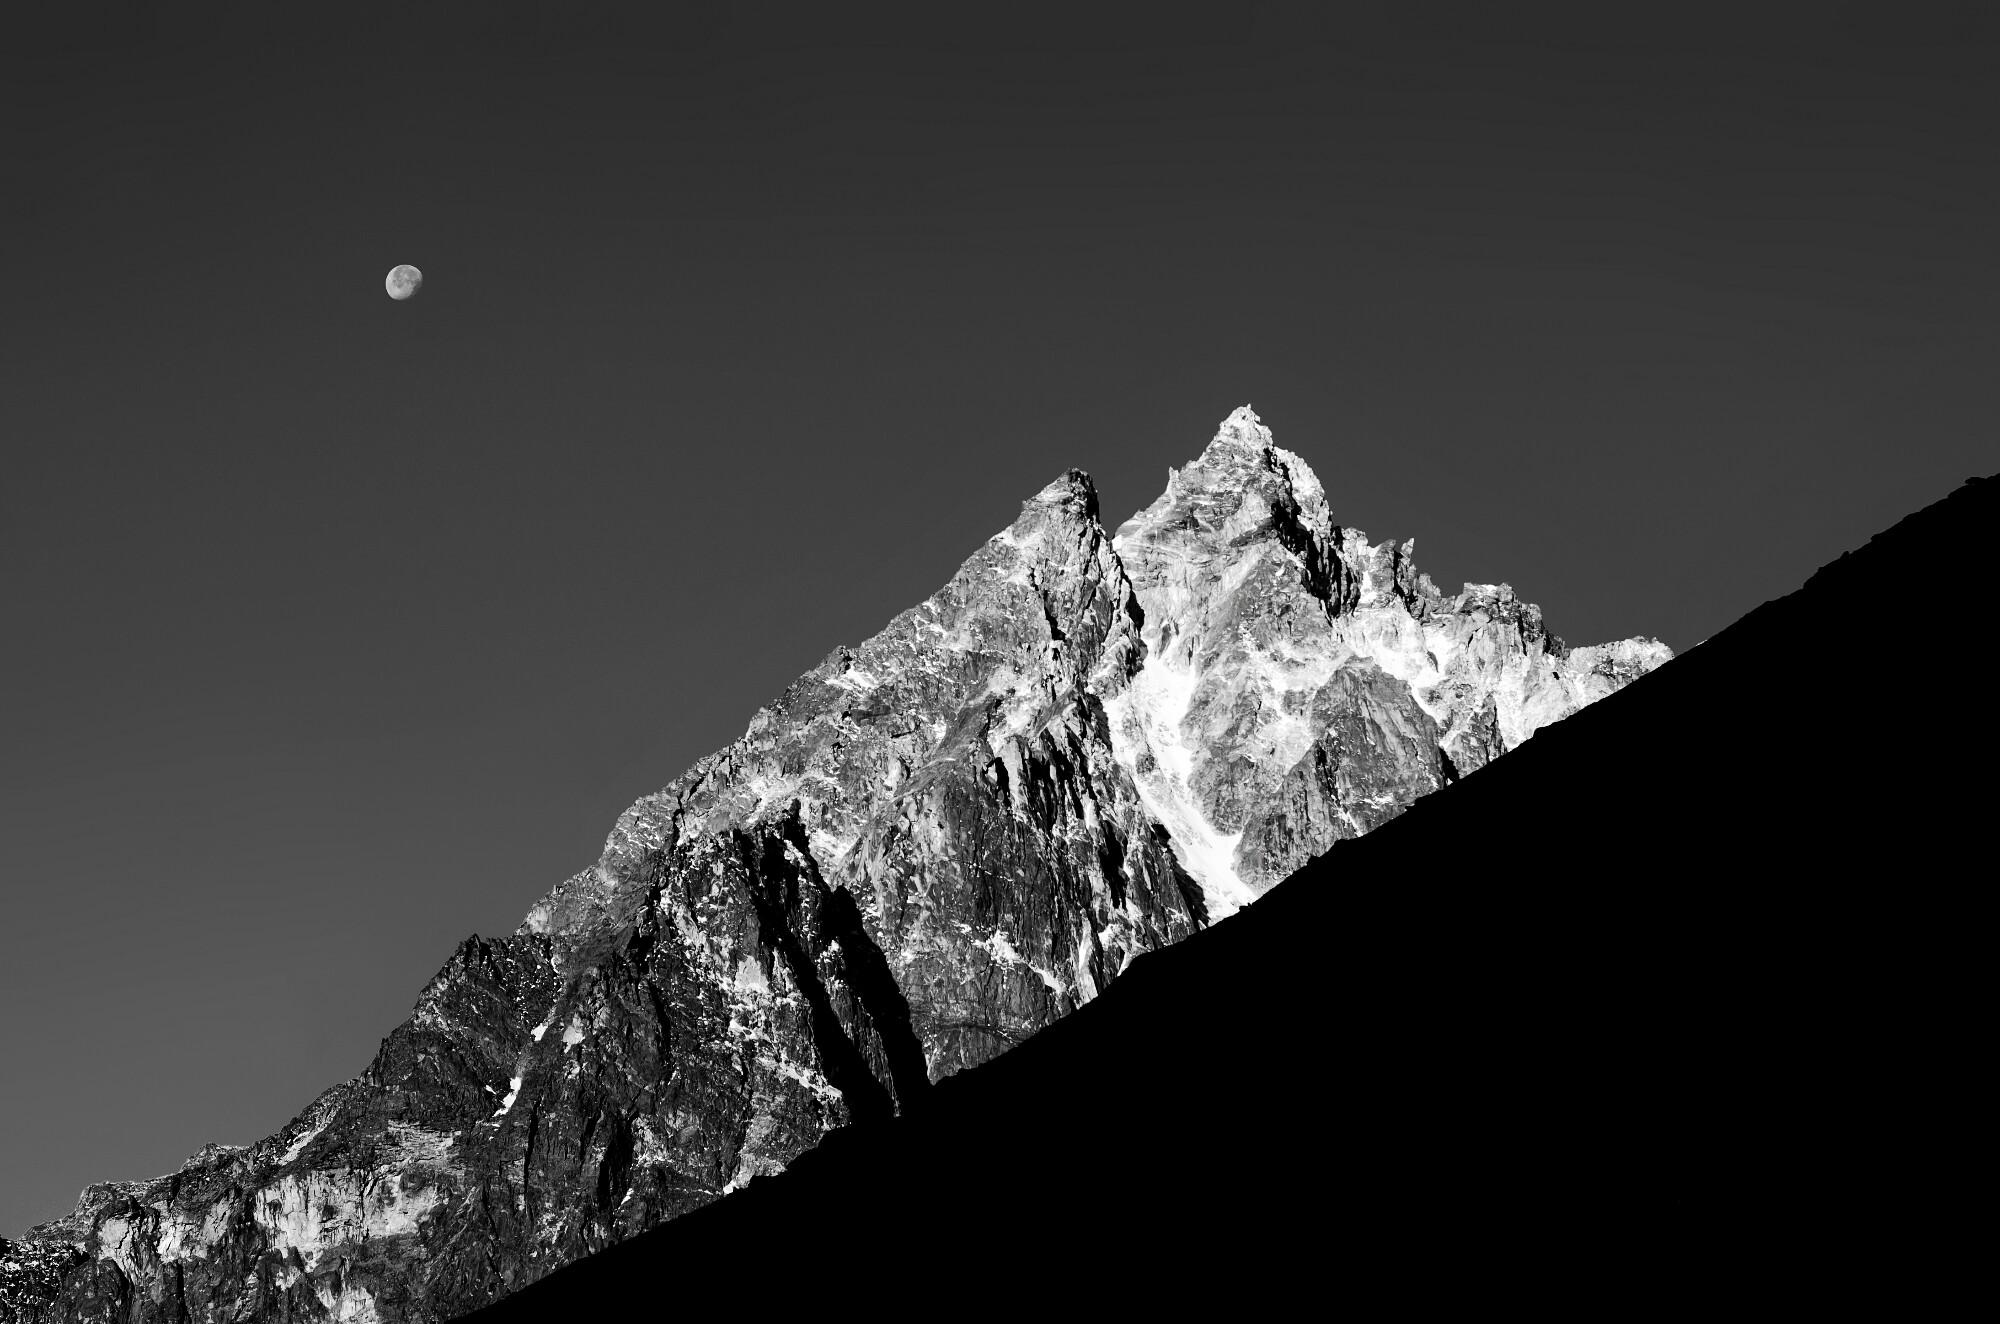 Frey's Peak in Kanchenjunga National Park, Sikkim